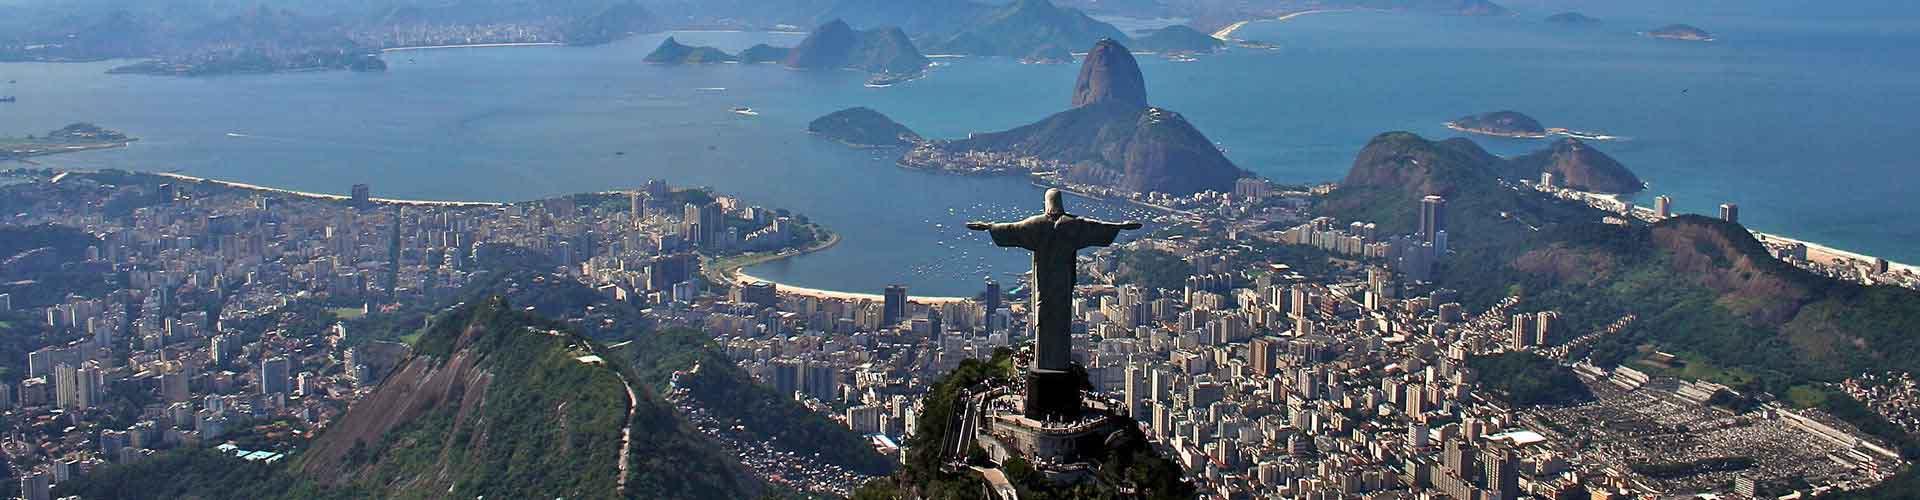 Rio de Janeiro – Hostellit kaupungiosassa Glória. Rio de Janeiro -karttoja, valokuvia ja arvosteluja kaikista Rio de Janeiro -hostelleista.